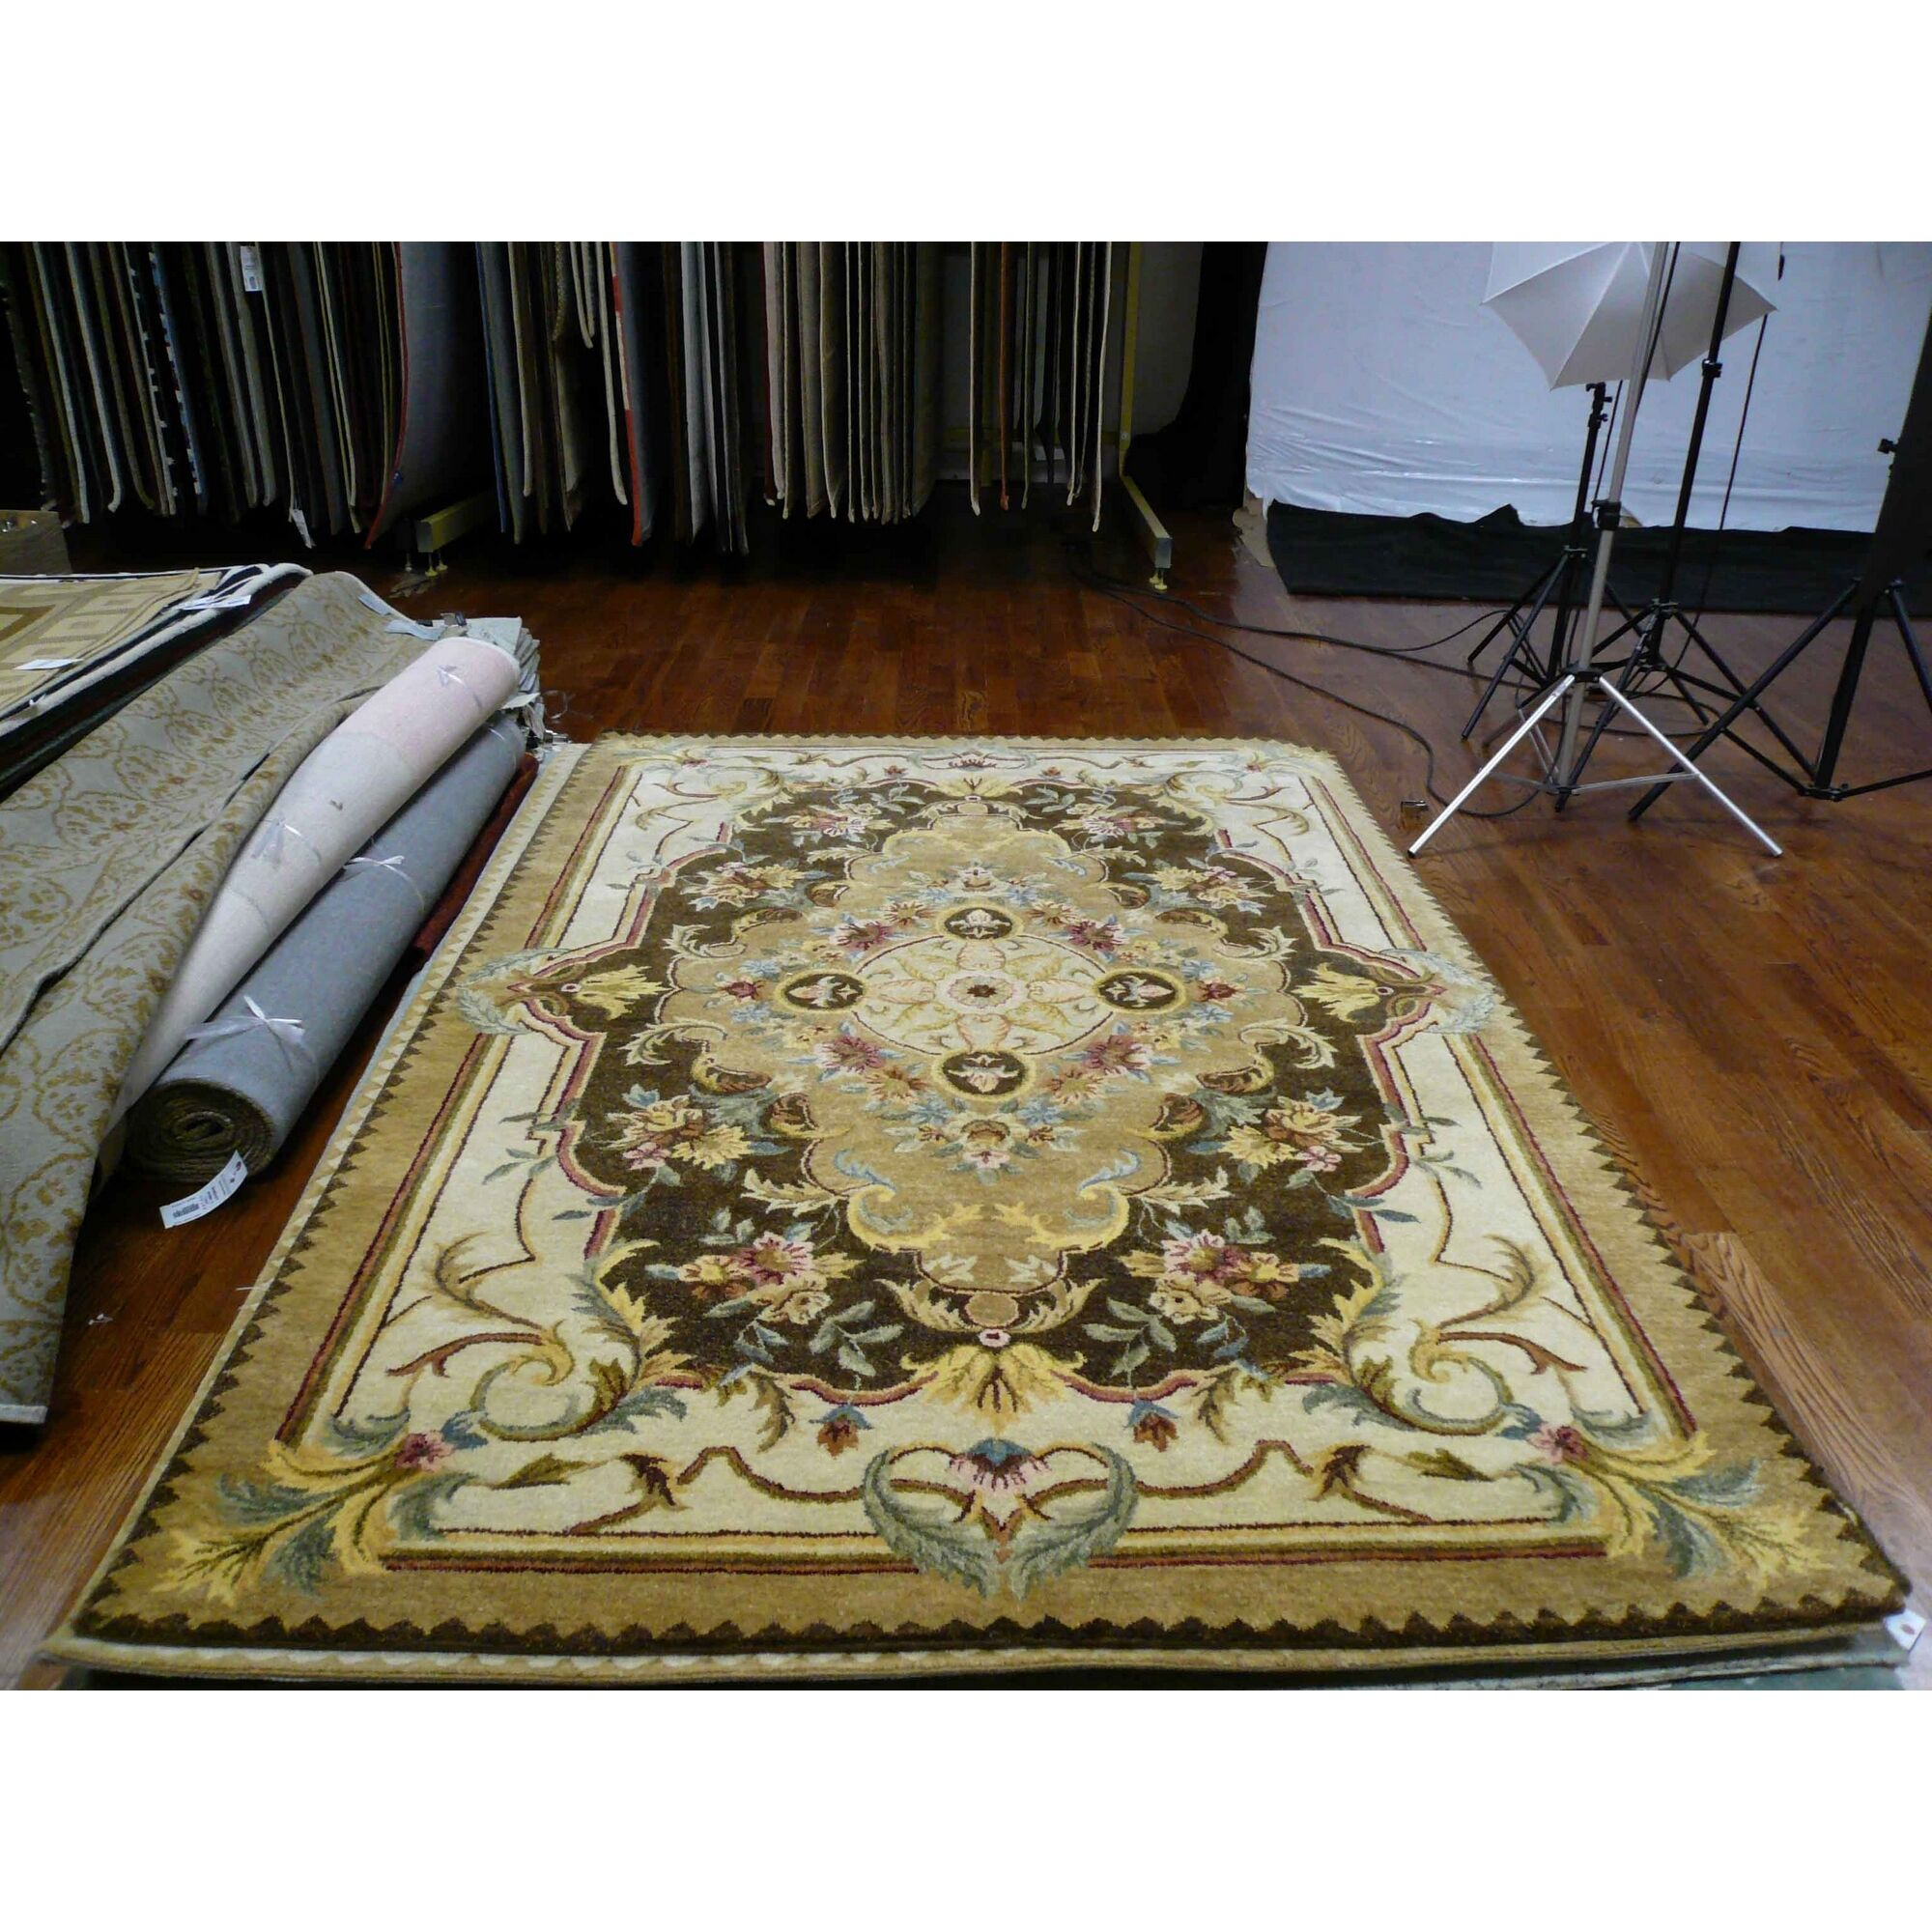 Bedgood Brown/Beige Area Rug Rug Size: Rectangle 6' x 9'